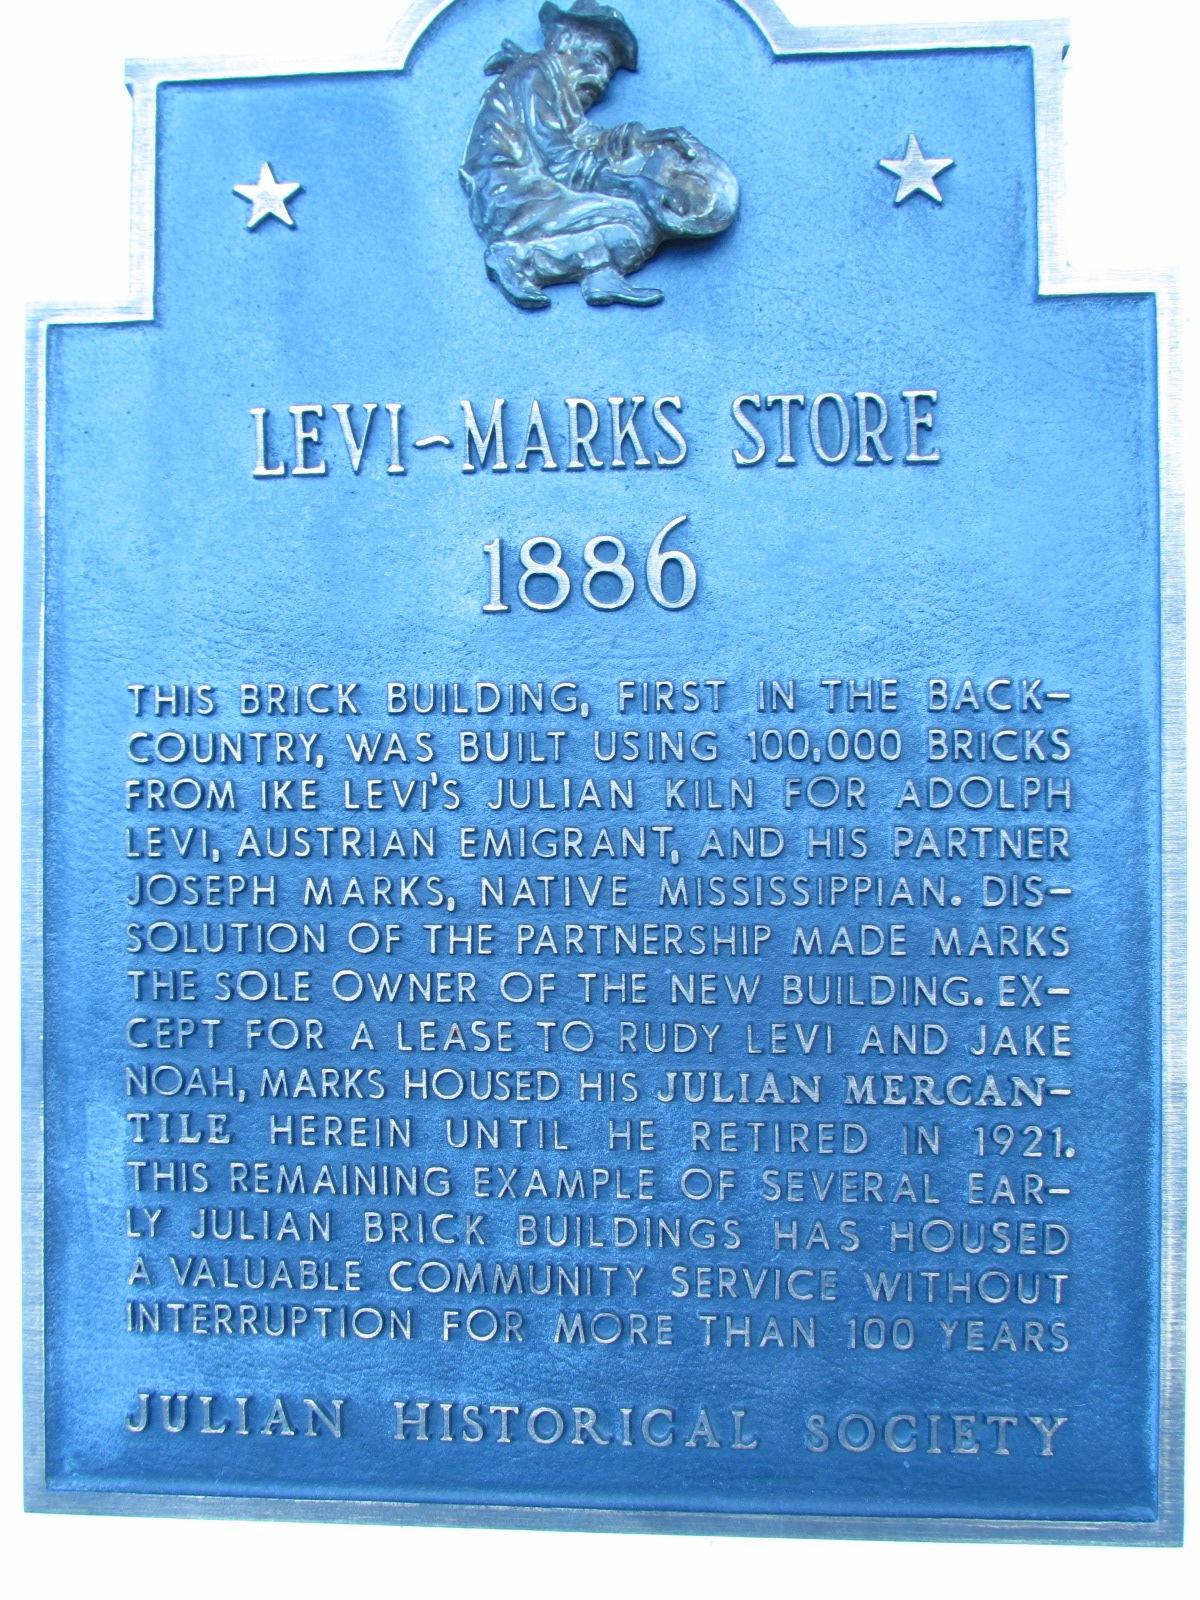 Julian Historical Society Levi Marks Store Sign